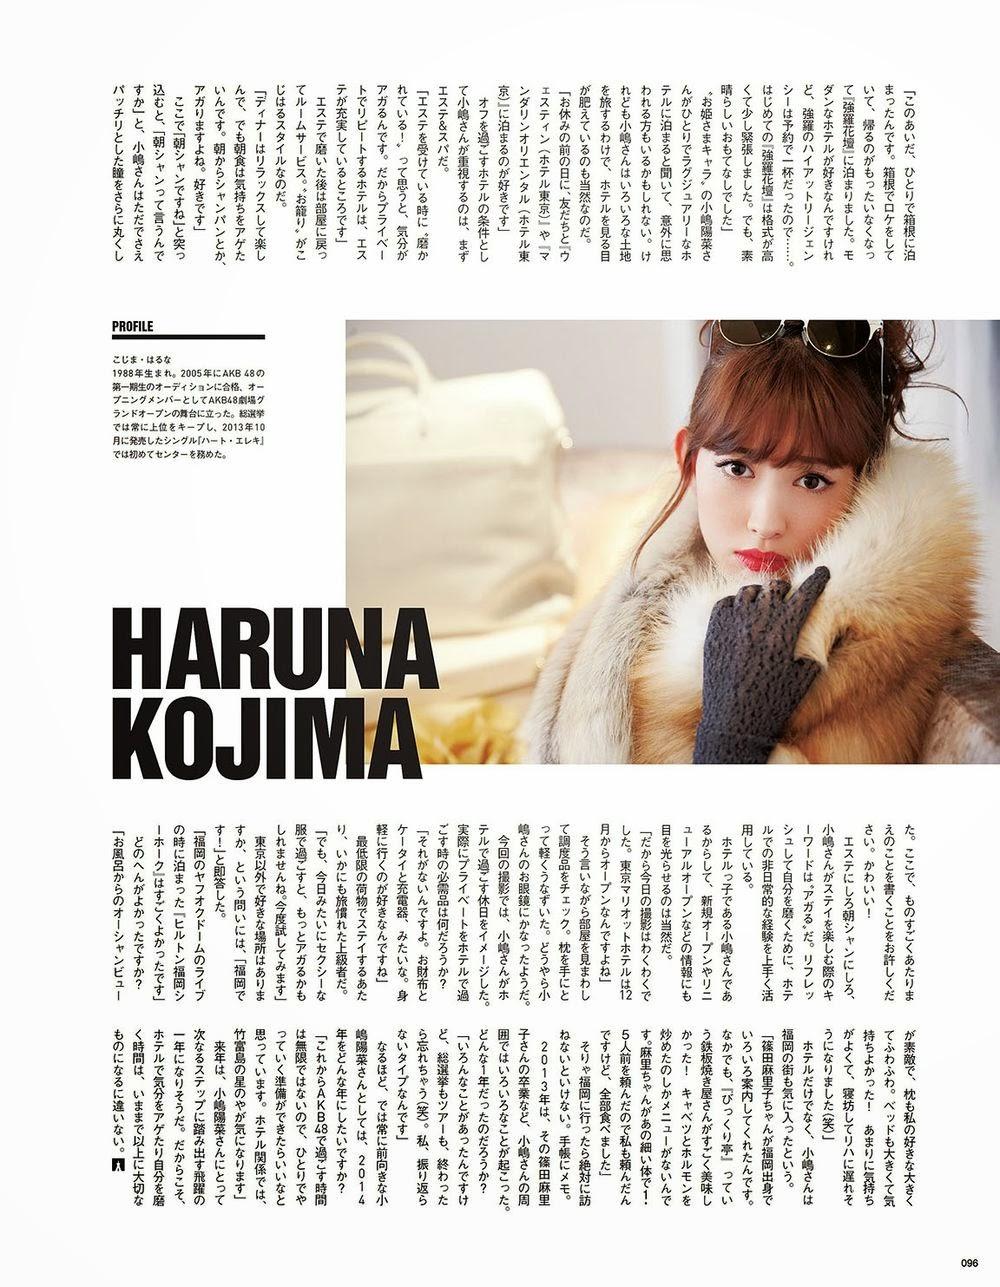 "AKB48 Haruna Kojima ""Luxury Stay in The Hotel"" on Tokyo Calendar ..."